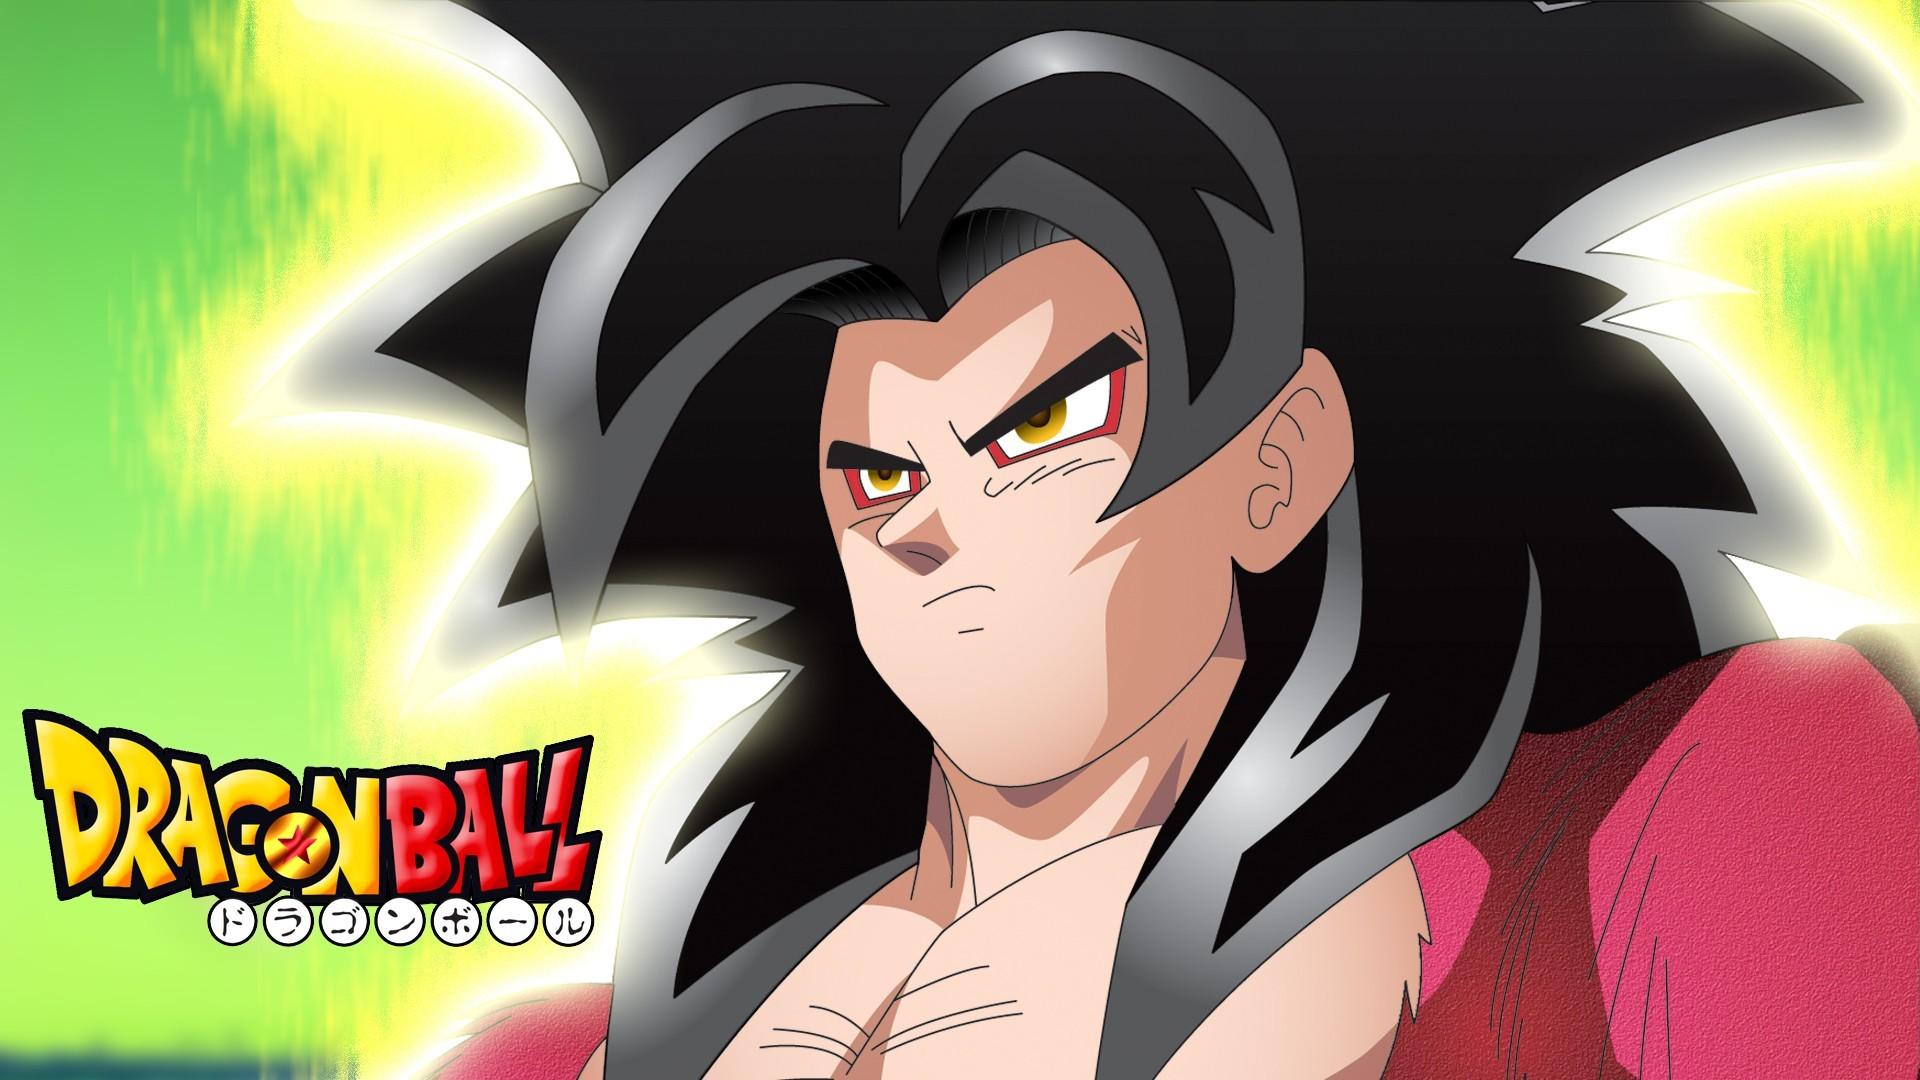 … Super Saiyan 4 Goku 1920 x 1200